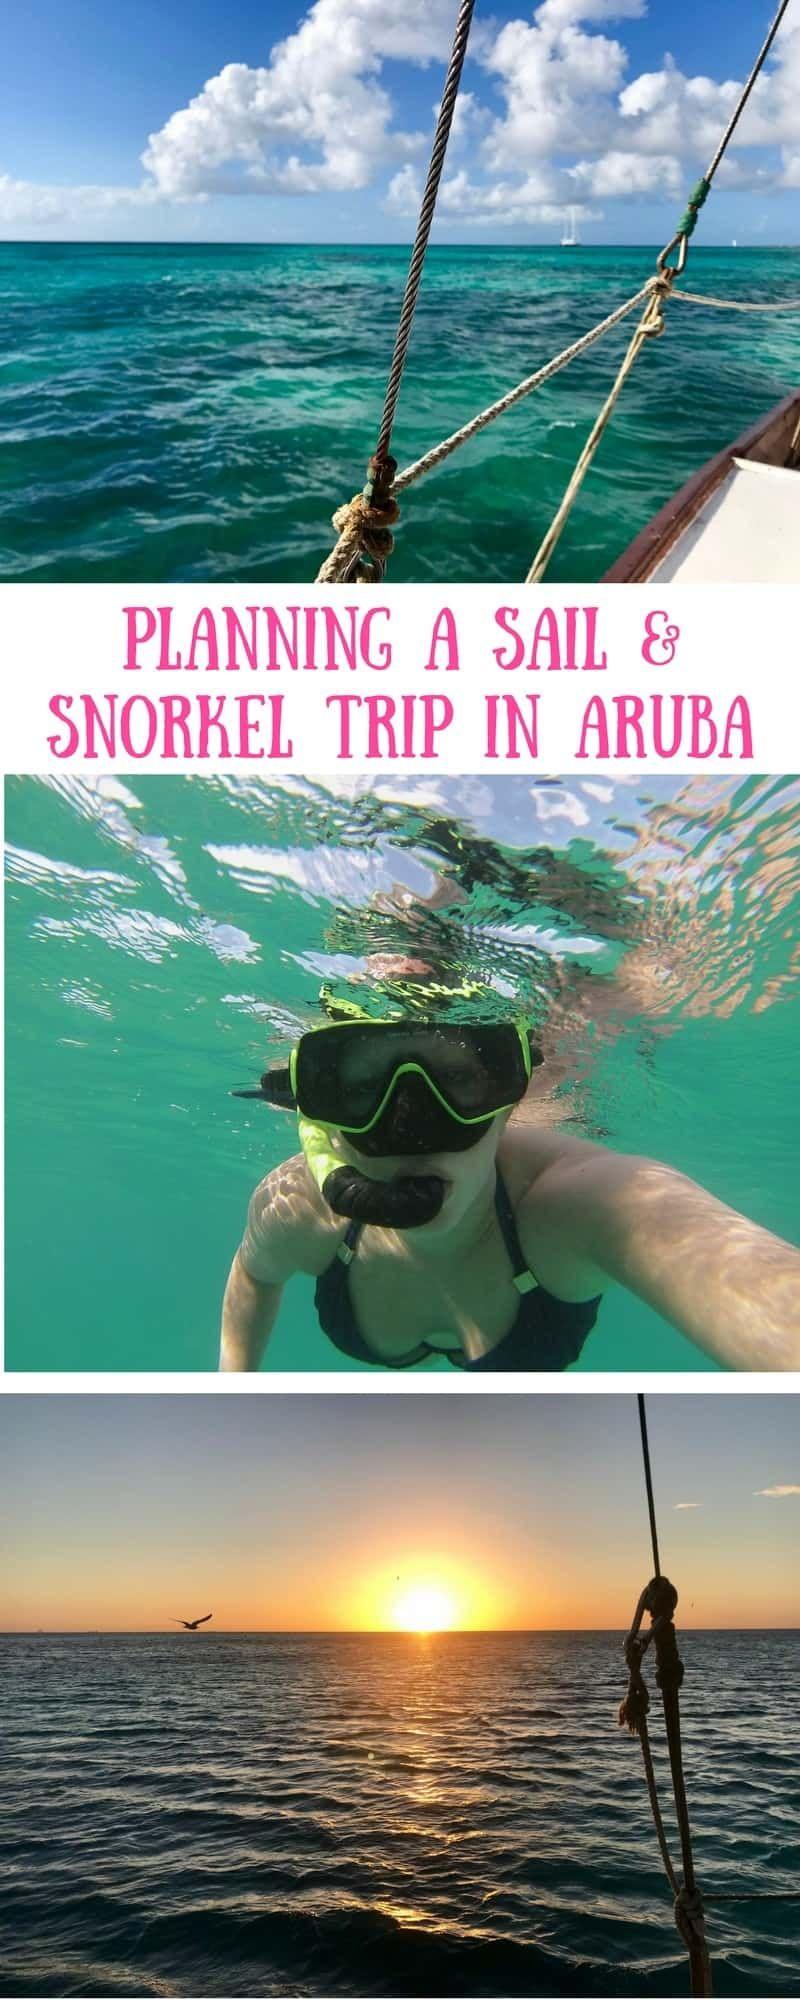 Aruba sailing trips, snorkel on the Black Pearl catamaran in Aruba! I loved this chill, beautiful boat trip, the snorkeling, & a gorgeous Aruba sunset | what to do in Aruba, Aruba trip planning, Aruba itinerary ideas, boat trips in Aruba, snorkeling trips in Aruba #aruba #sailing #caribbean